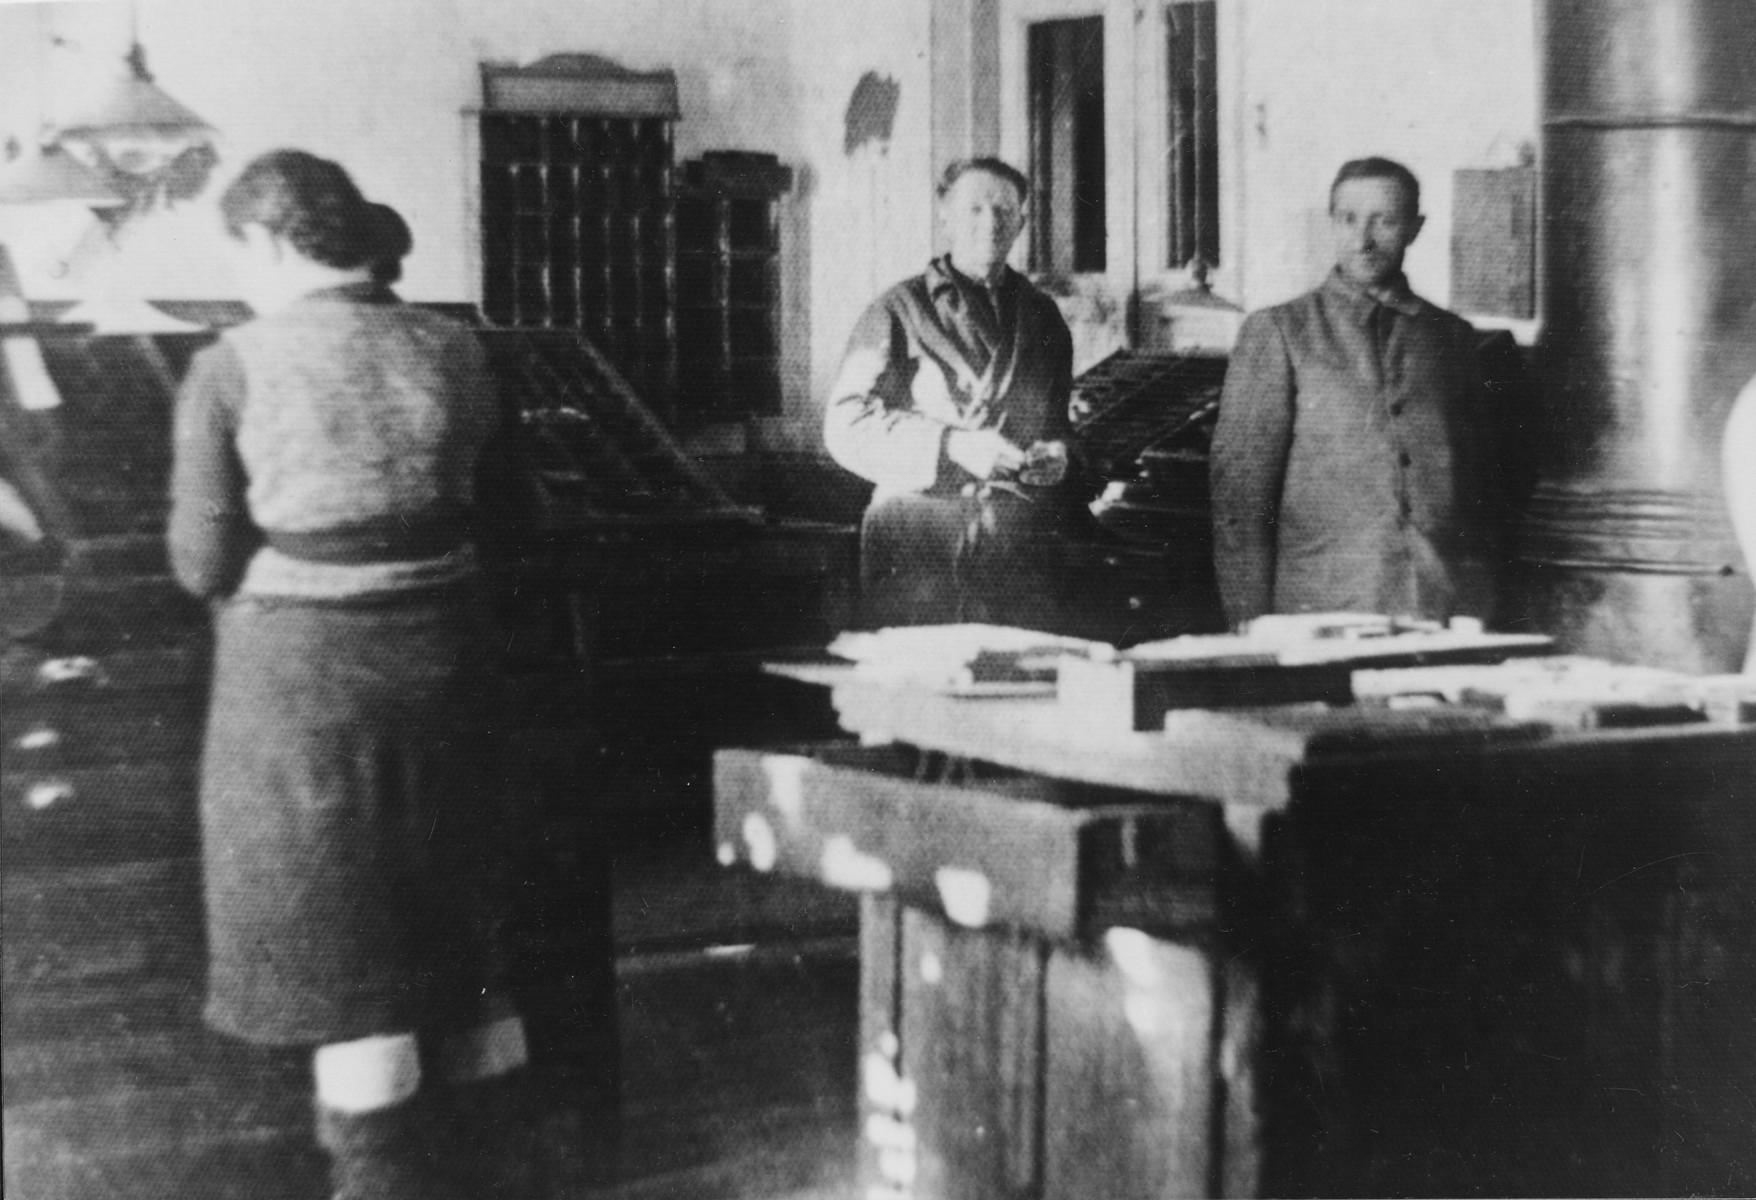 Jews working in a print shop in the Glubokoye ghetto.